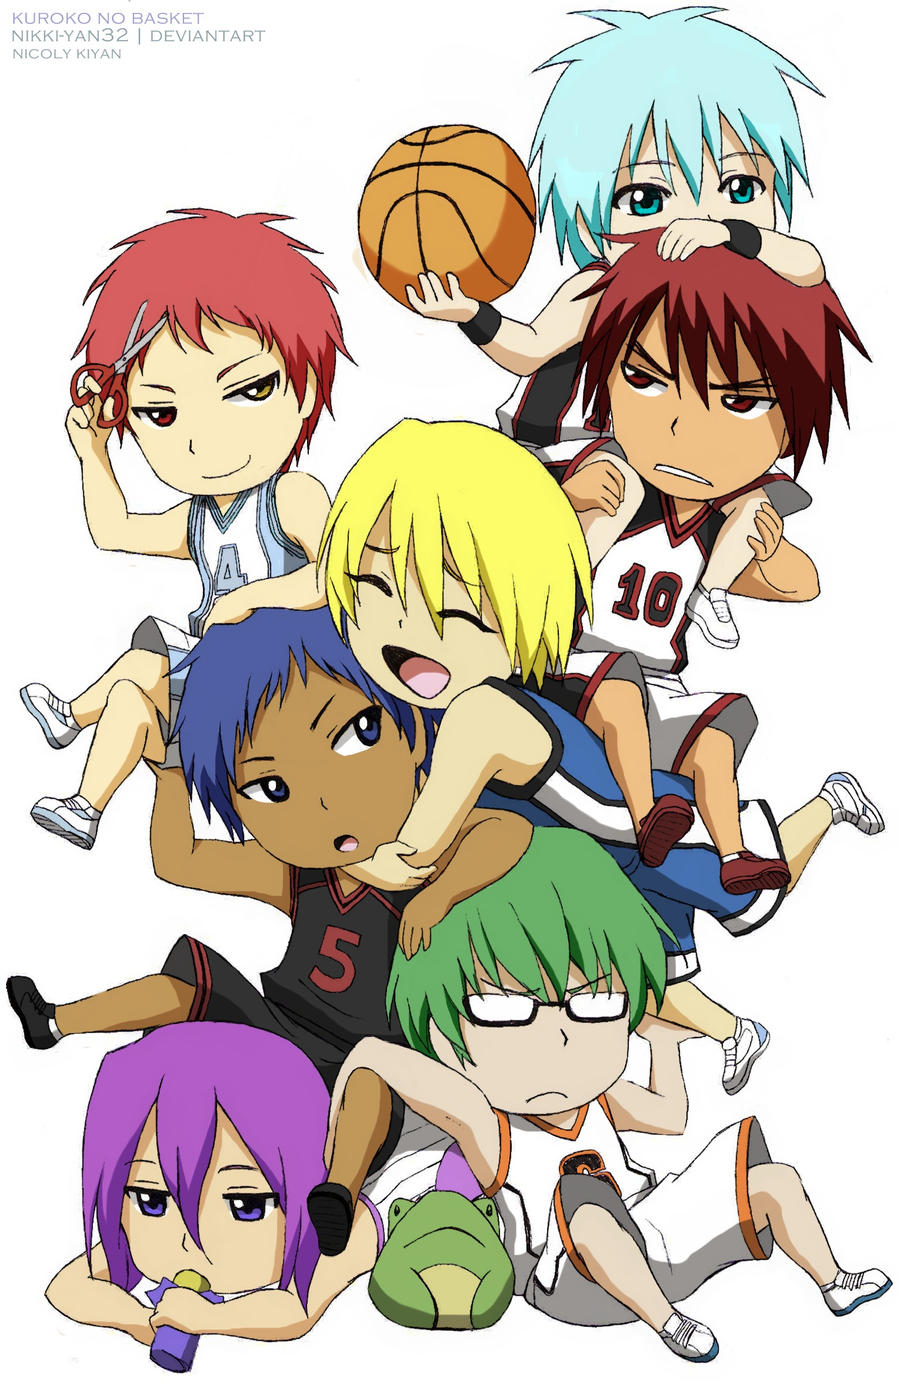 Kuroko no Basket - Chibi by nikki-yan32